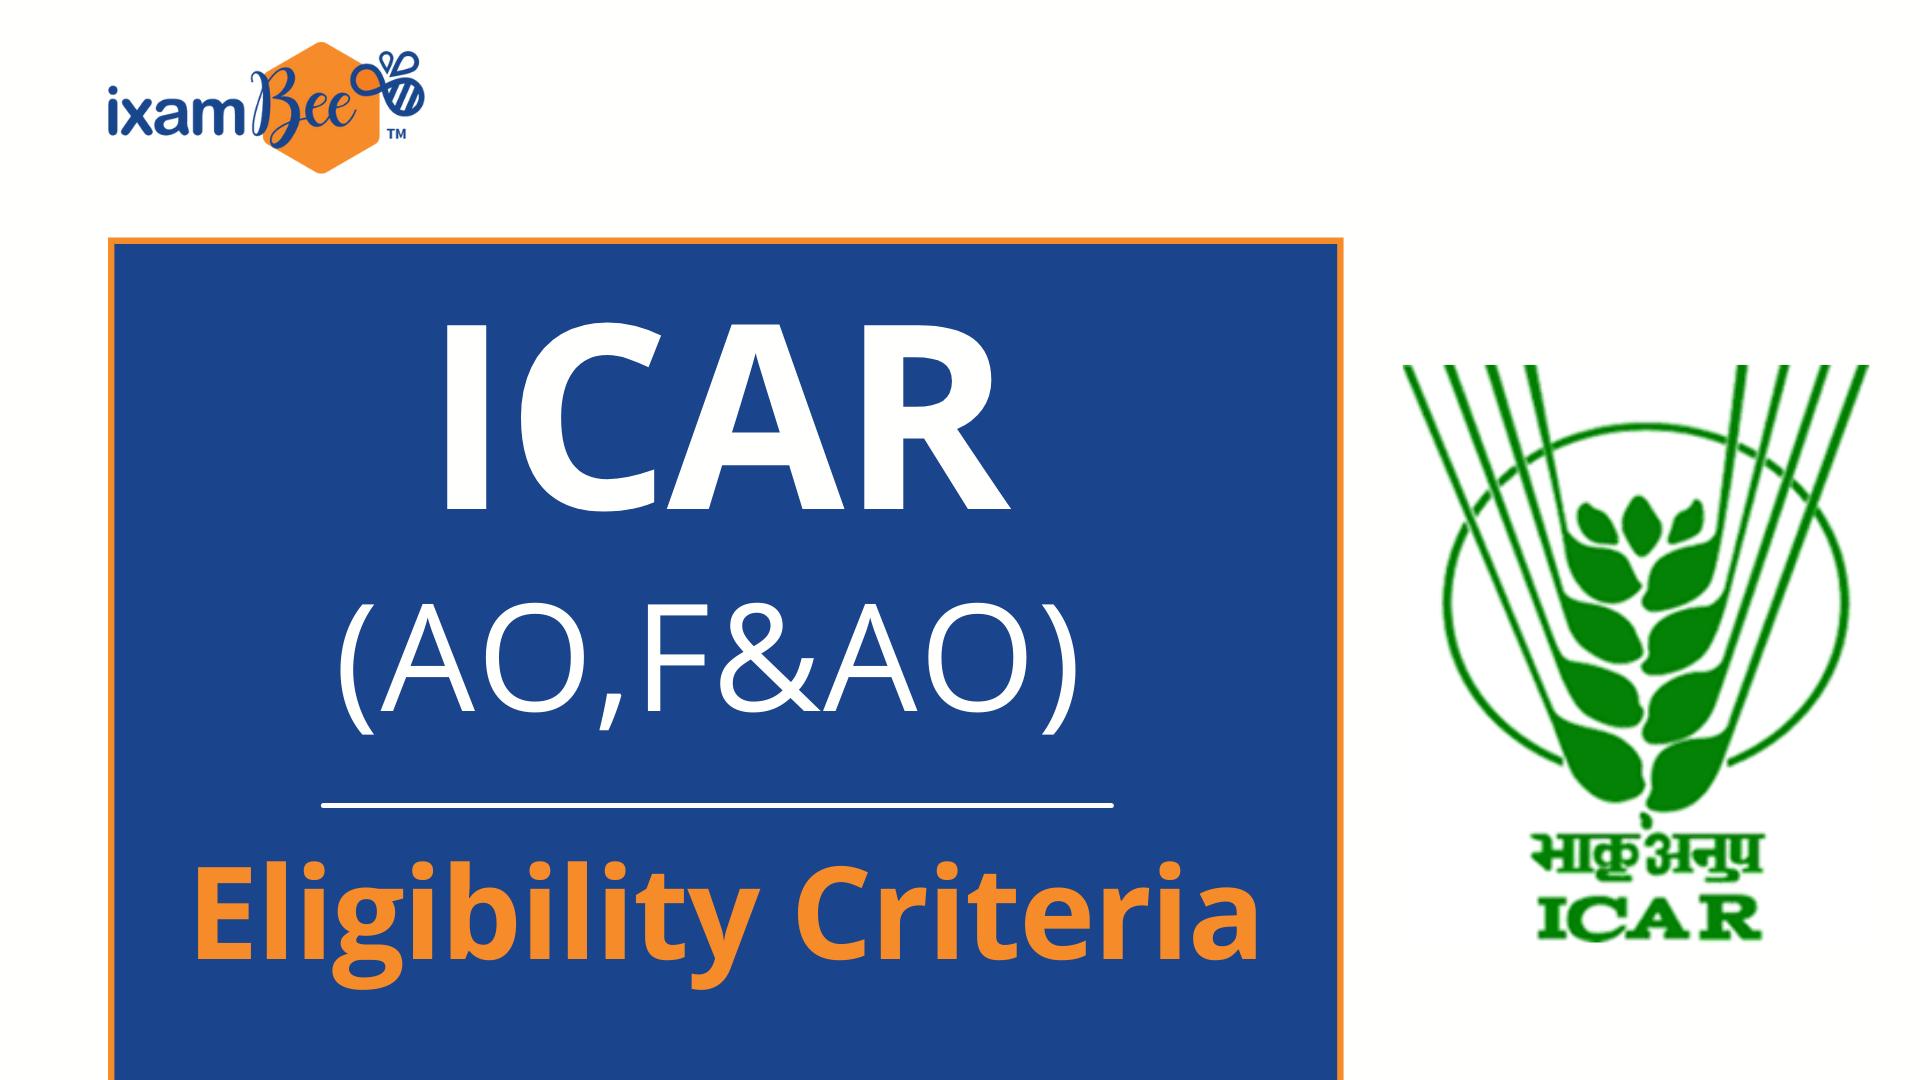 ICAR Eligibility